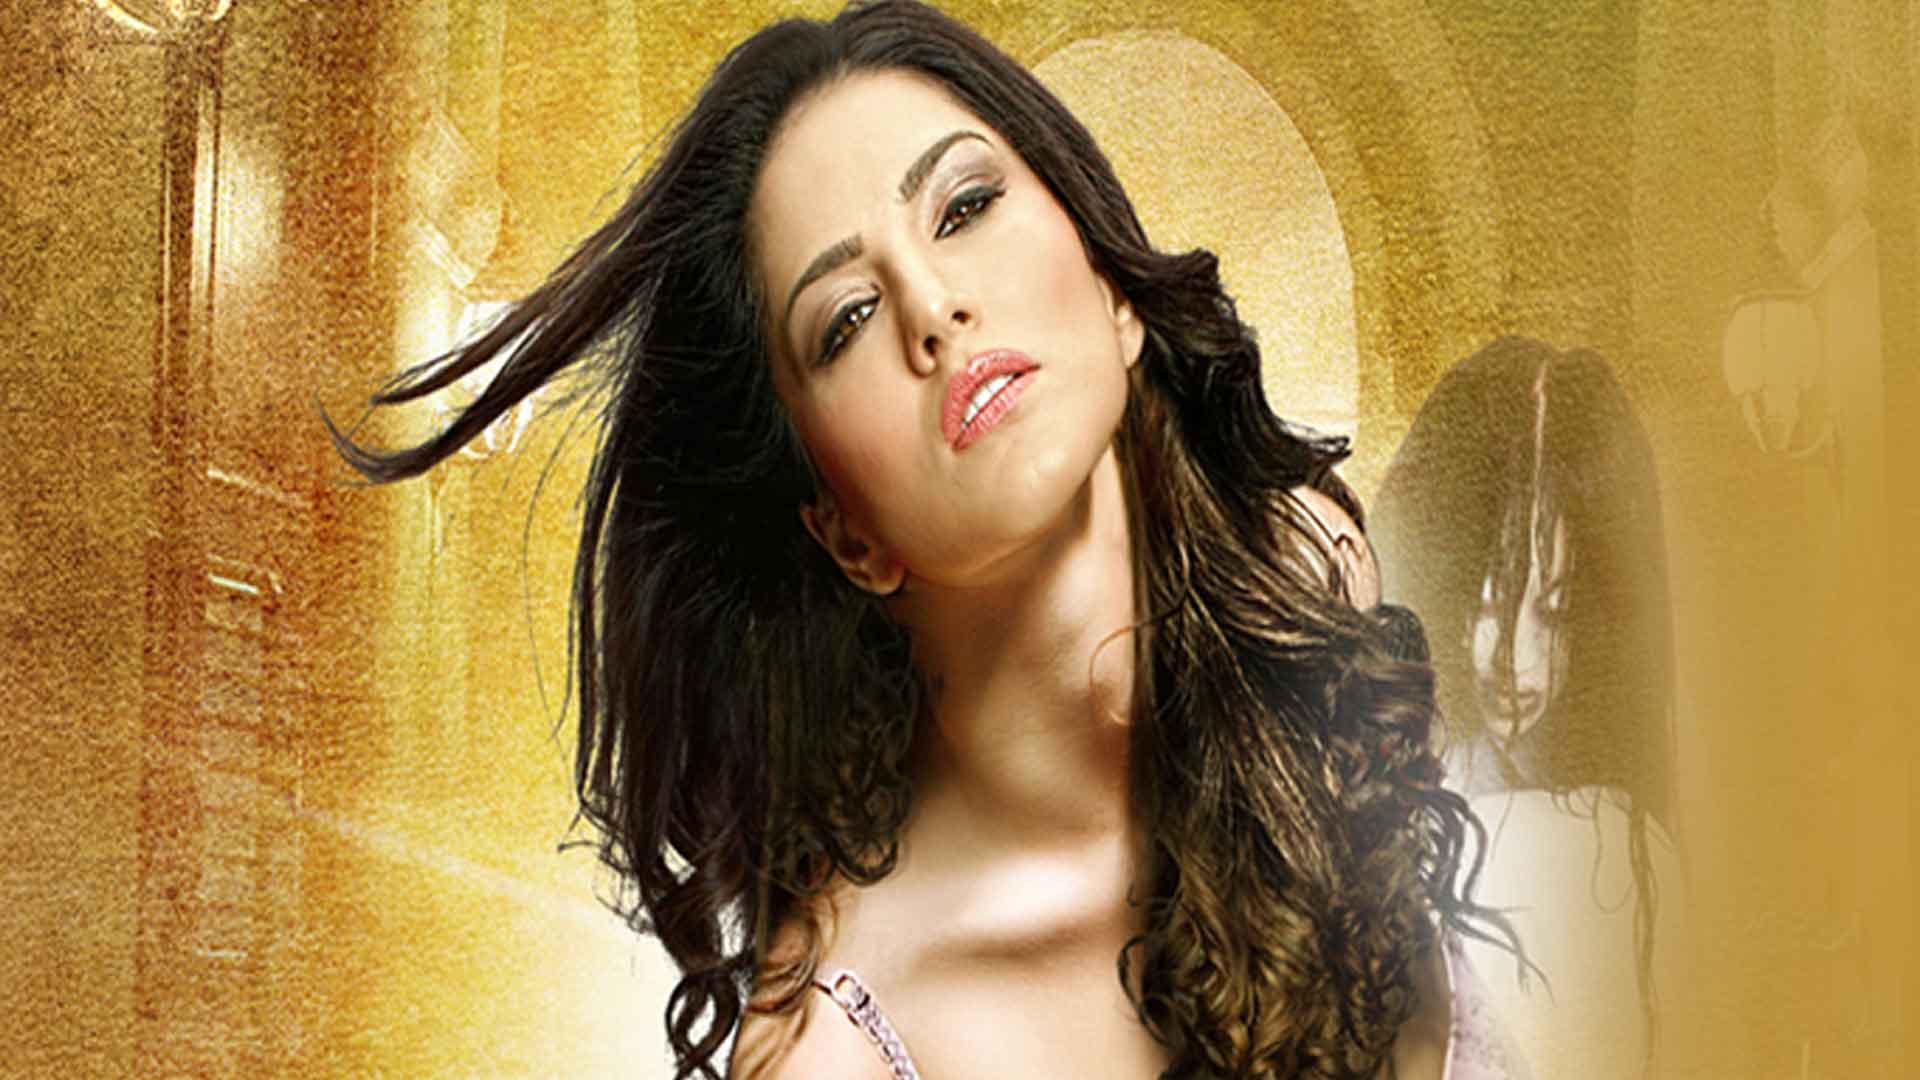 Nazar Full Movie Online Watch Nazar in Full HD Quality